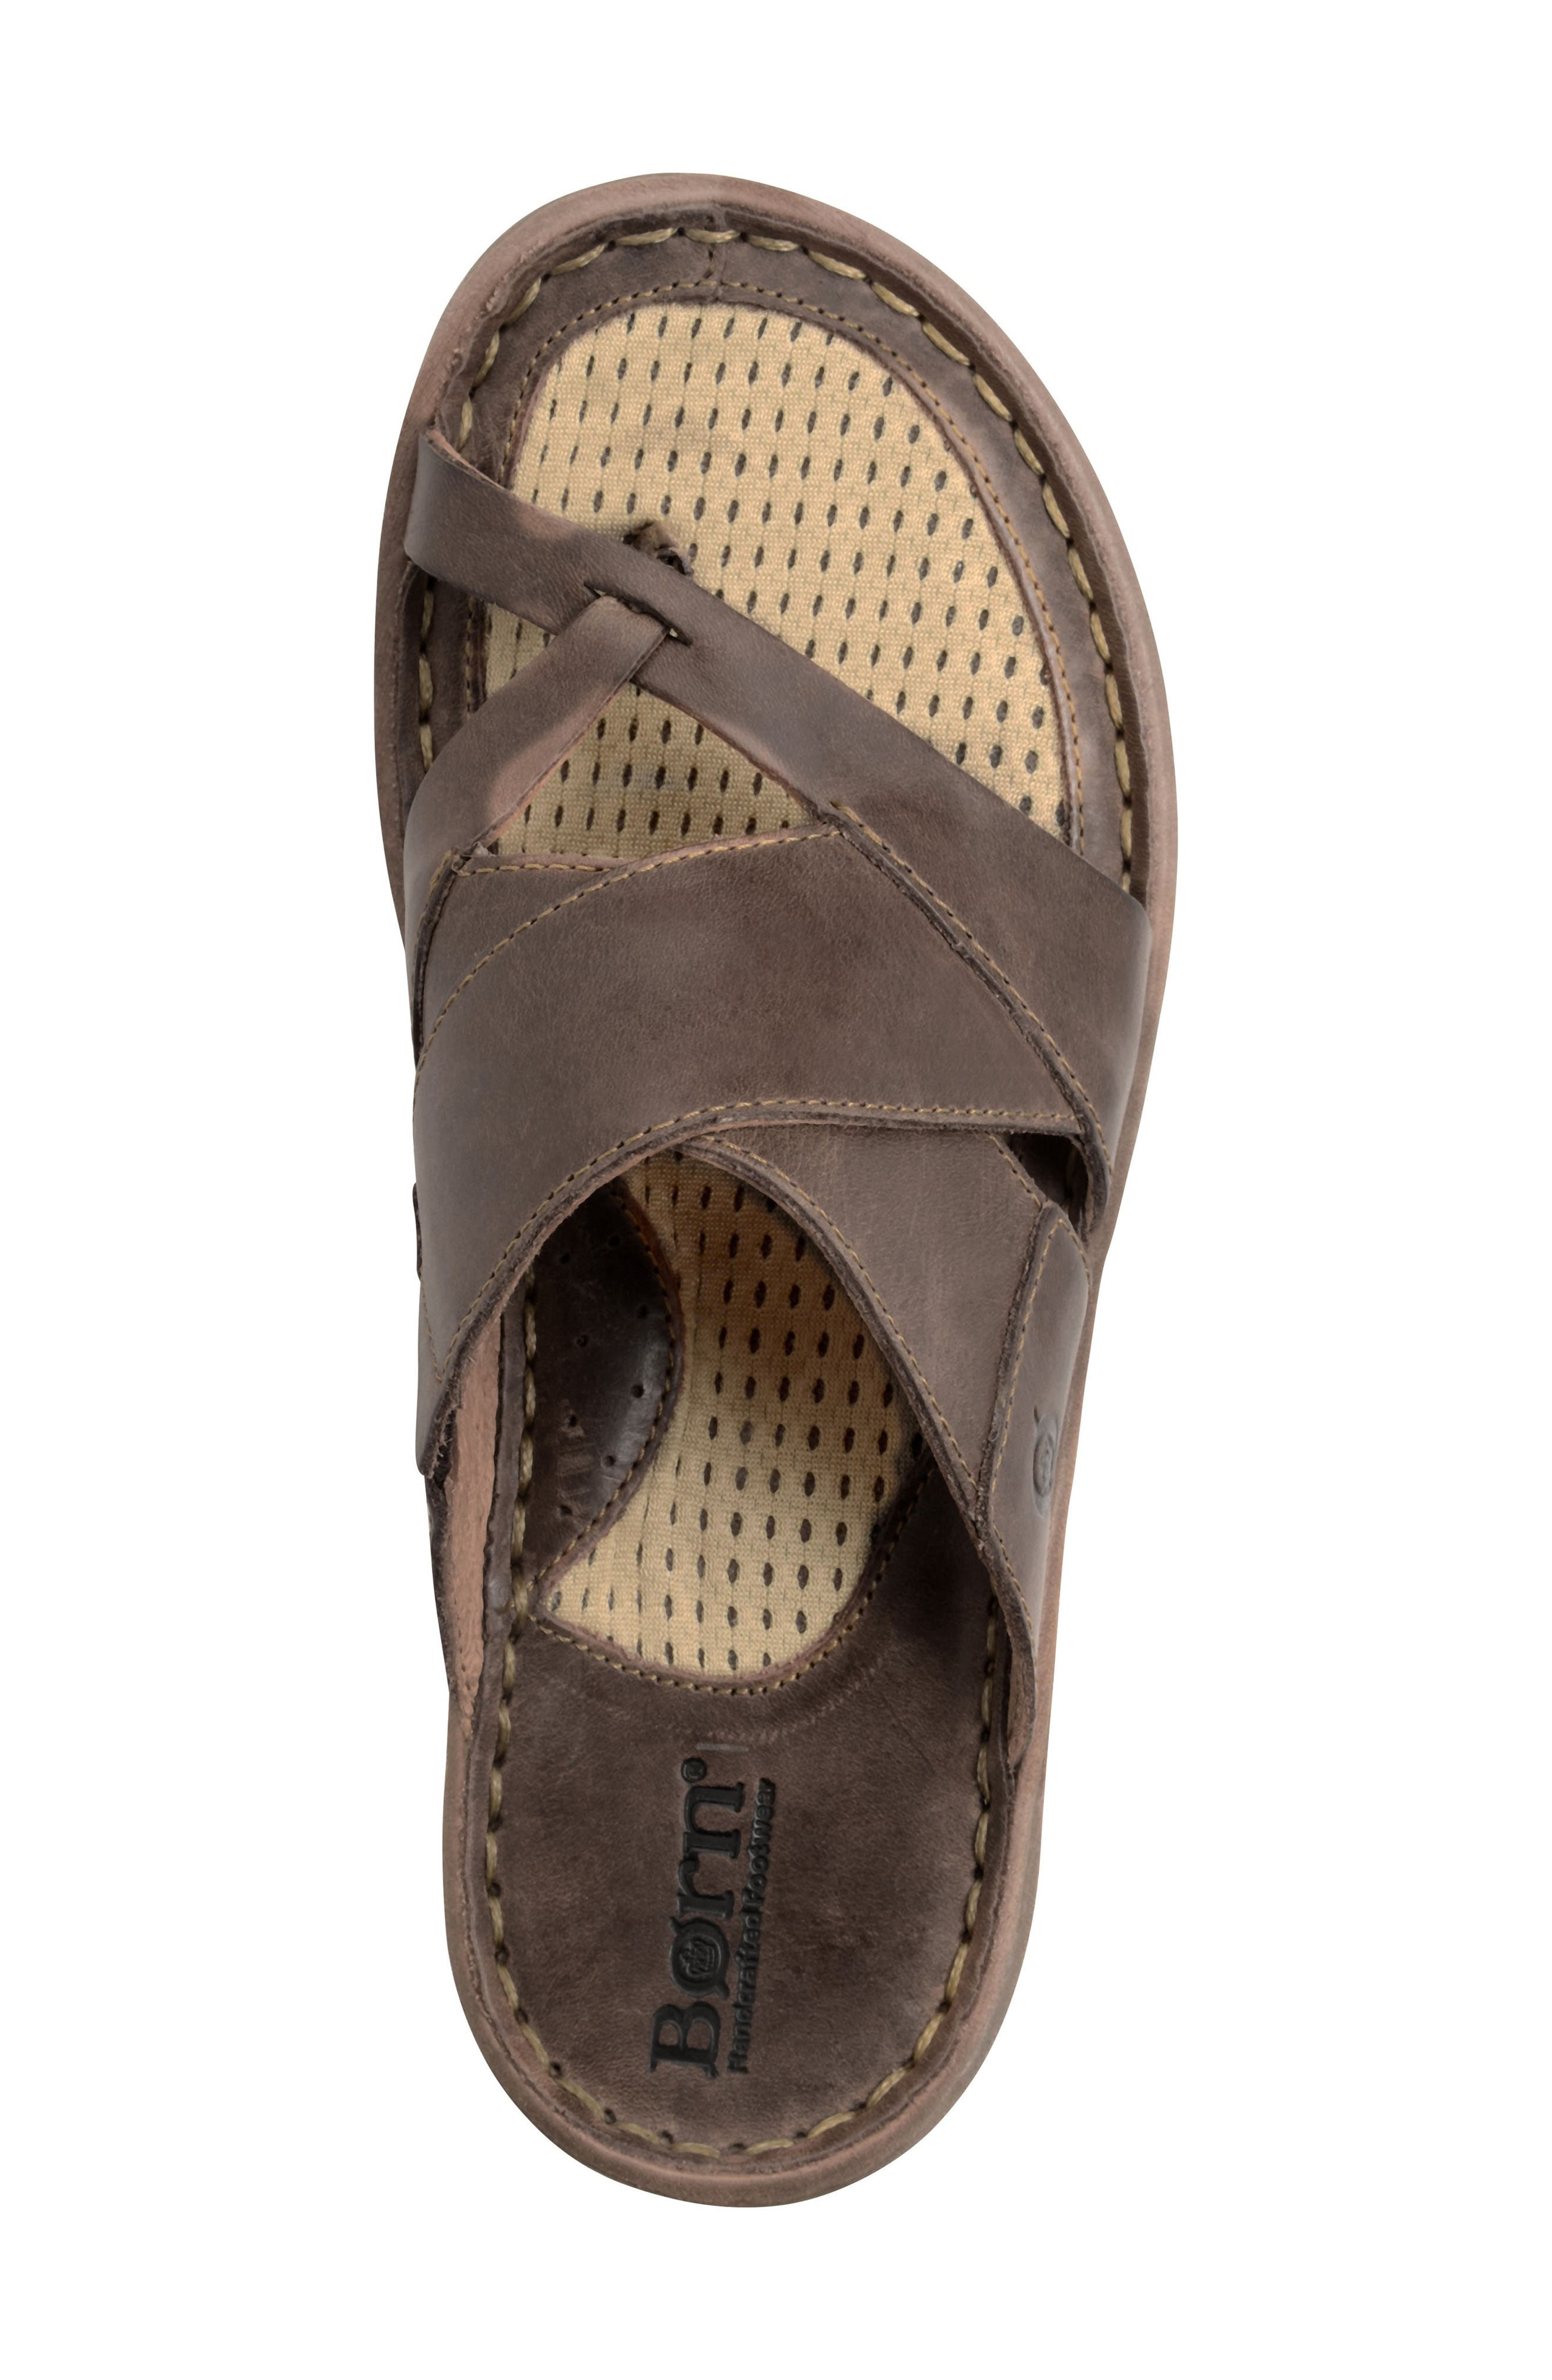 'Sorja' Leather Sandal,                             Alternate thumbnail 5, color,                             DARK BROWN LEATHER